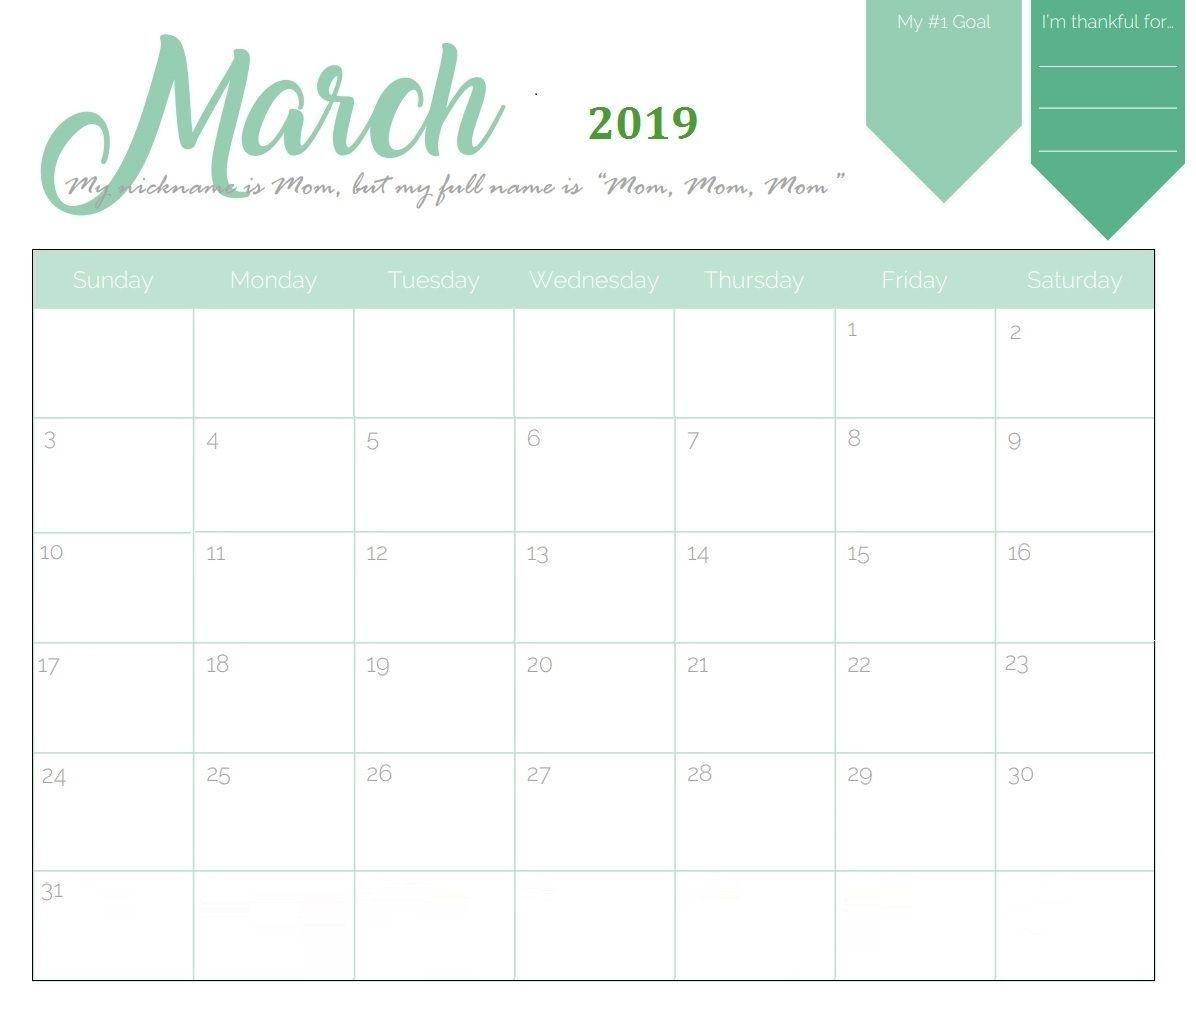 Printable Calendar 2019 Imom   Printable Calendar 2019 throughout Imom Calendar 2020